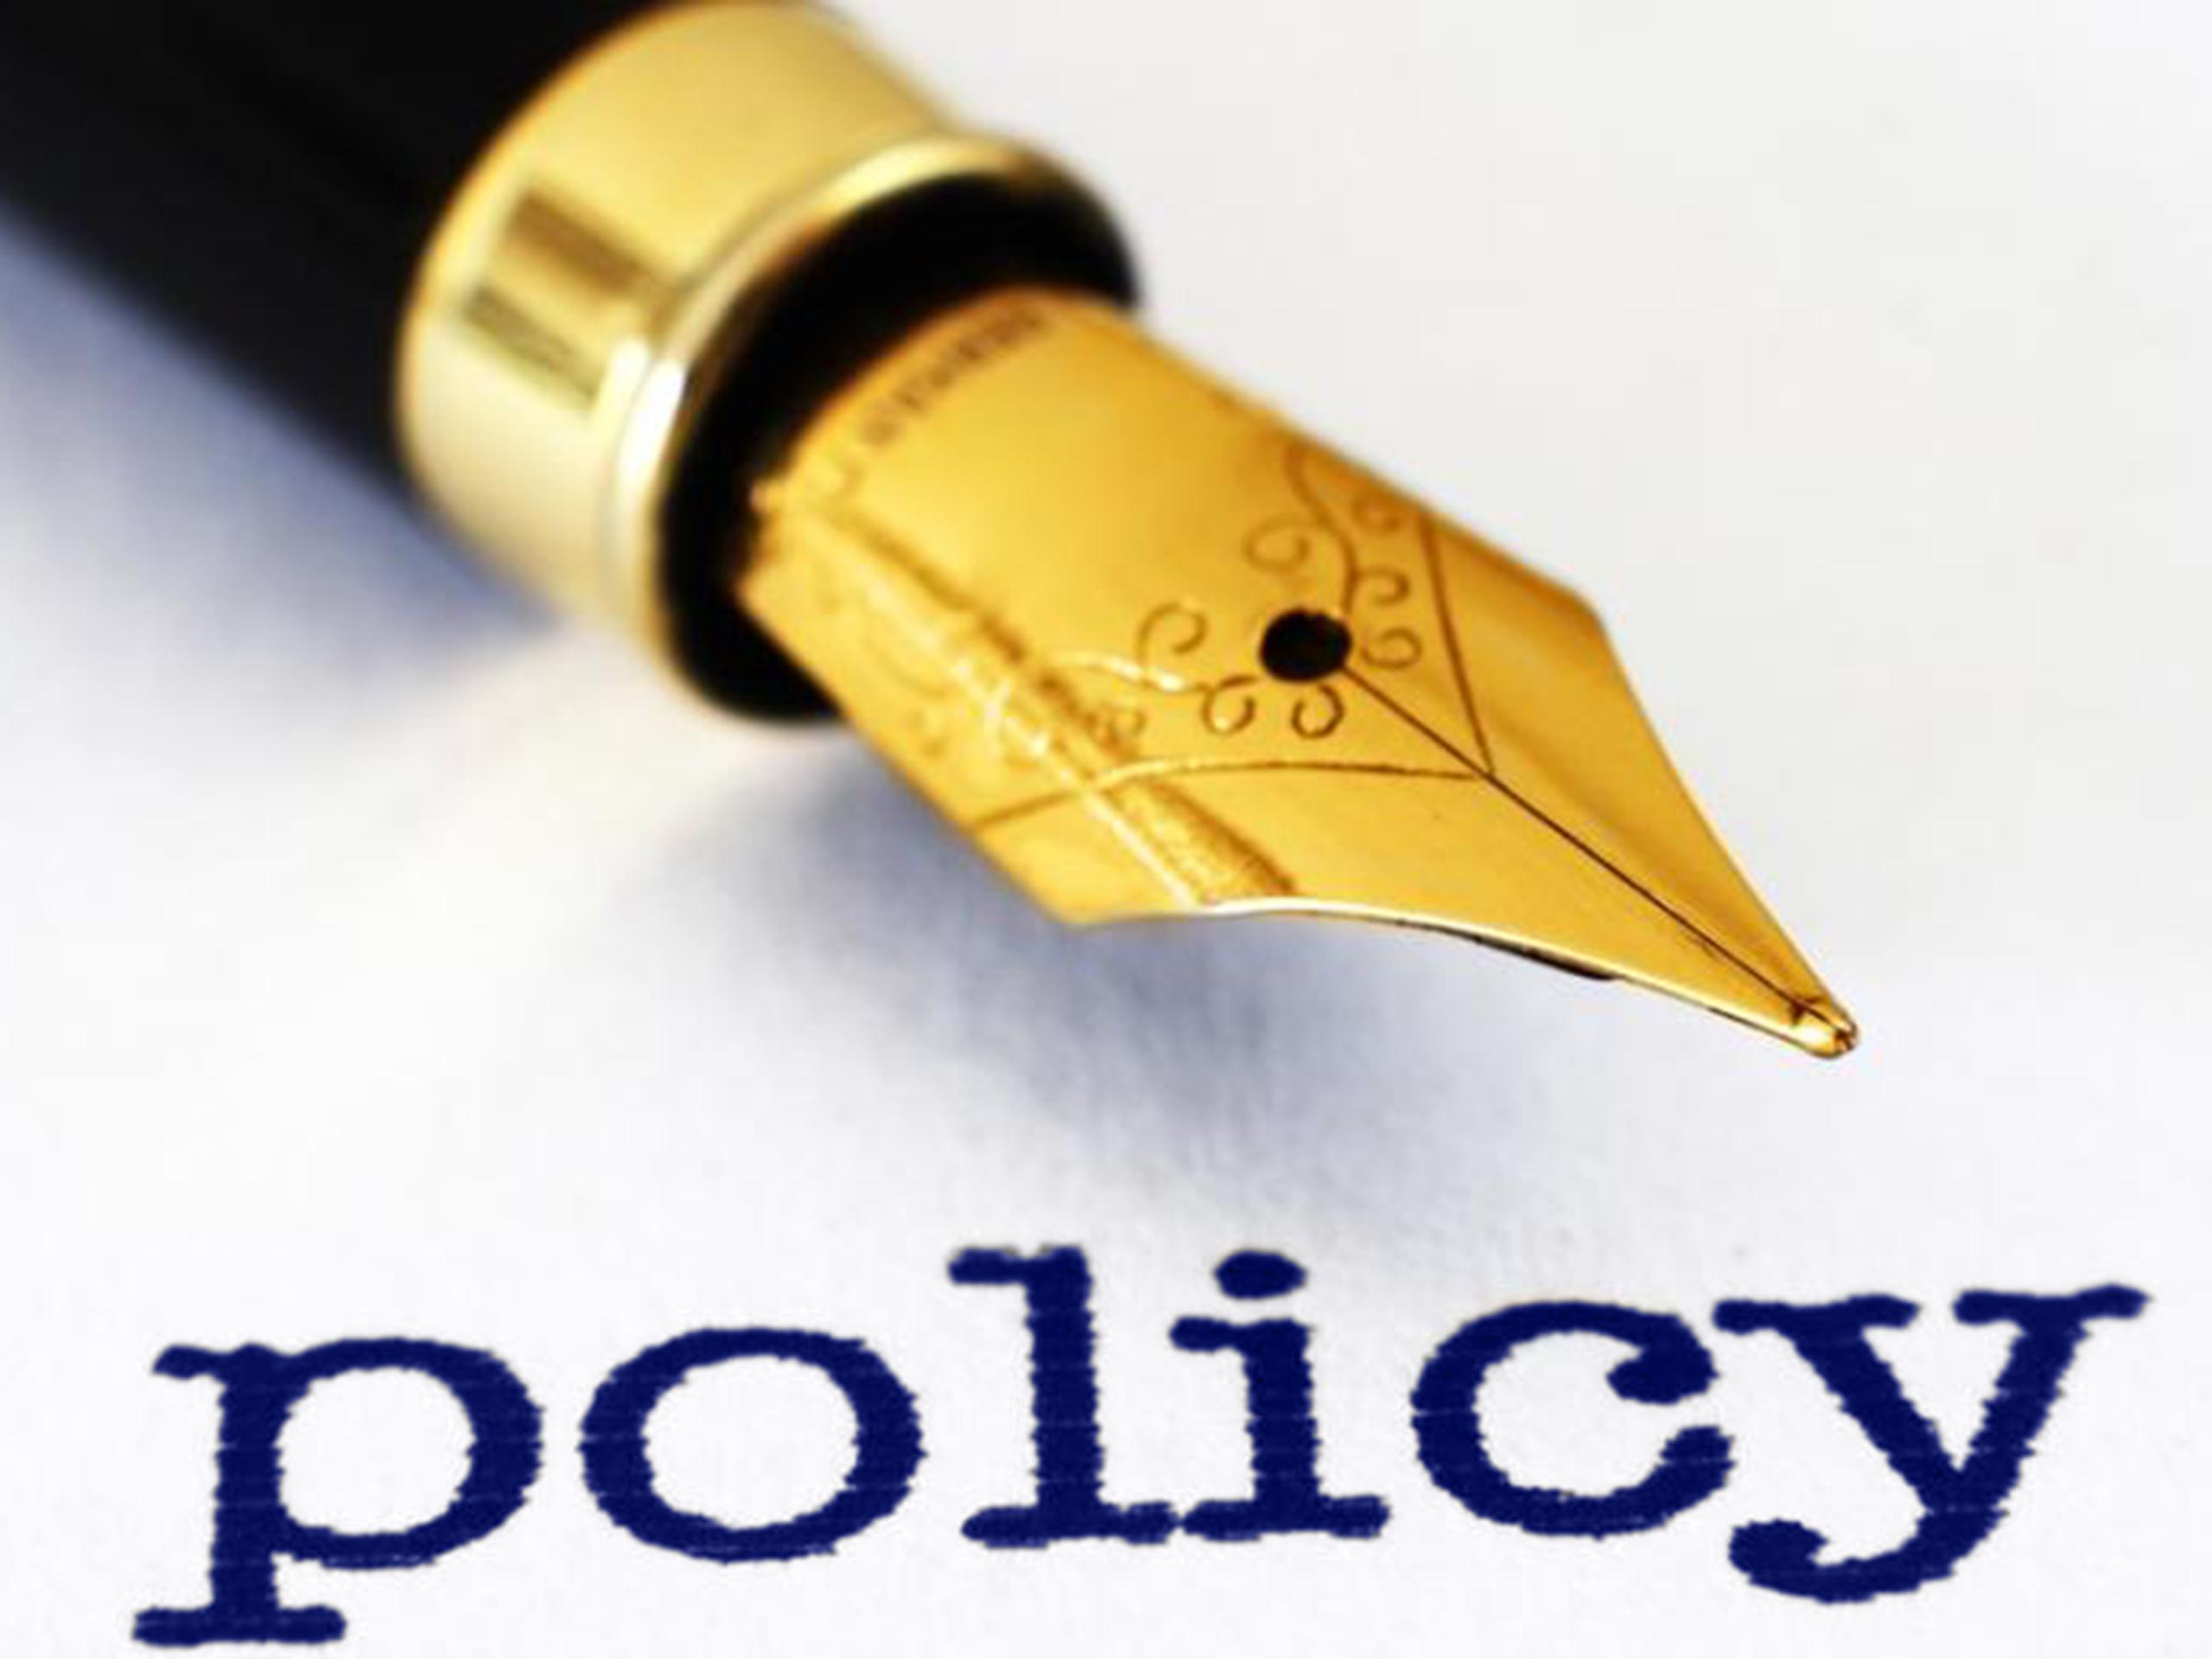 Karnataka state policy on handling COVID-19 needs depth